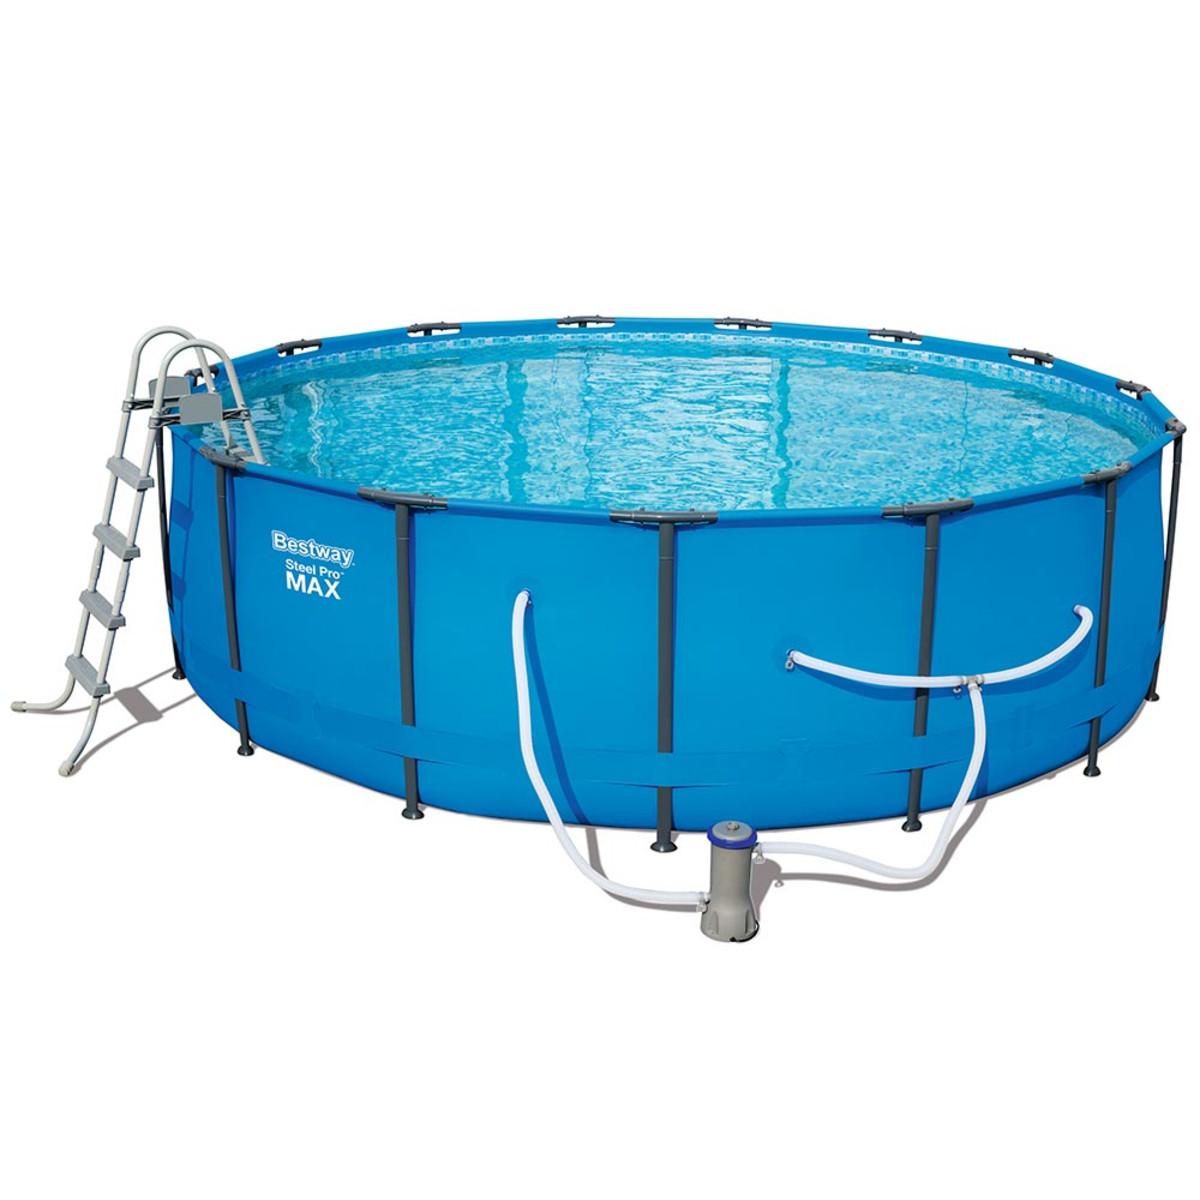 Bestway 15 X 48 Quot Steel Pro Max Pool Set Splash Super Center